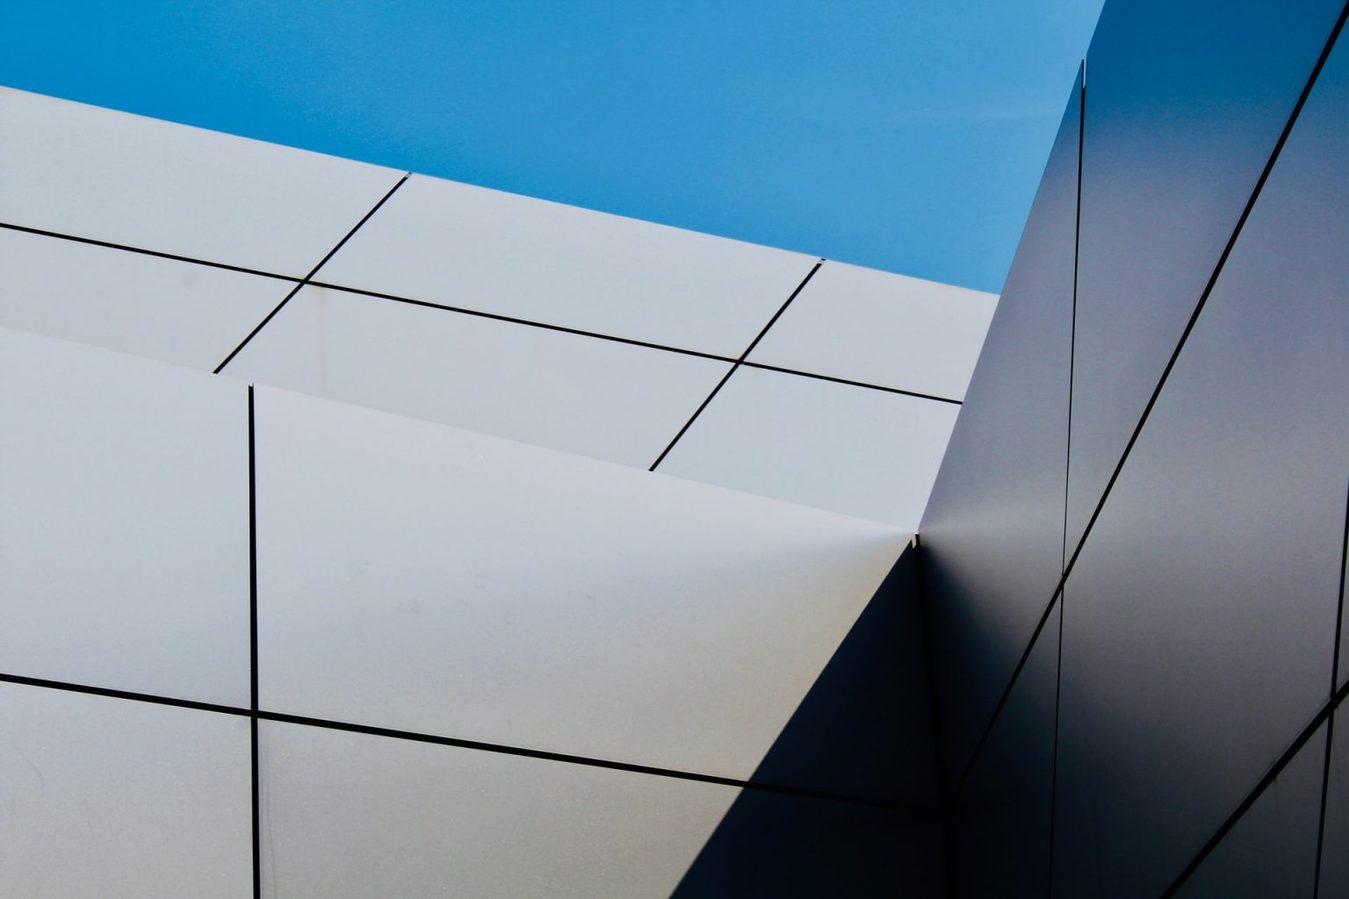 Abstrakcja architektury